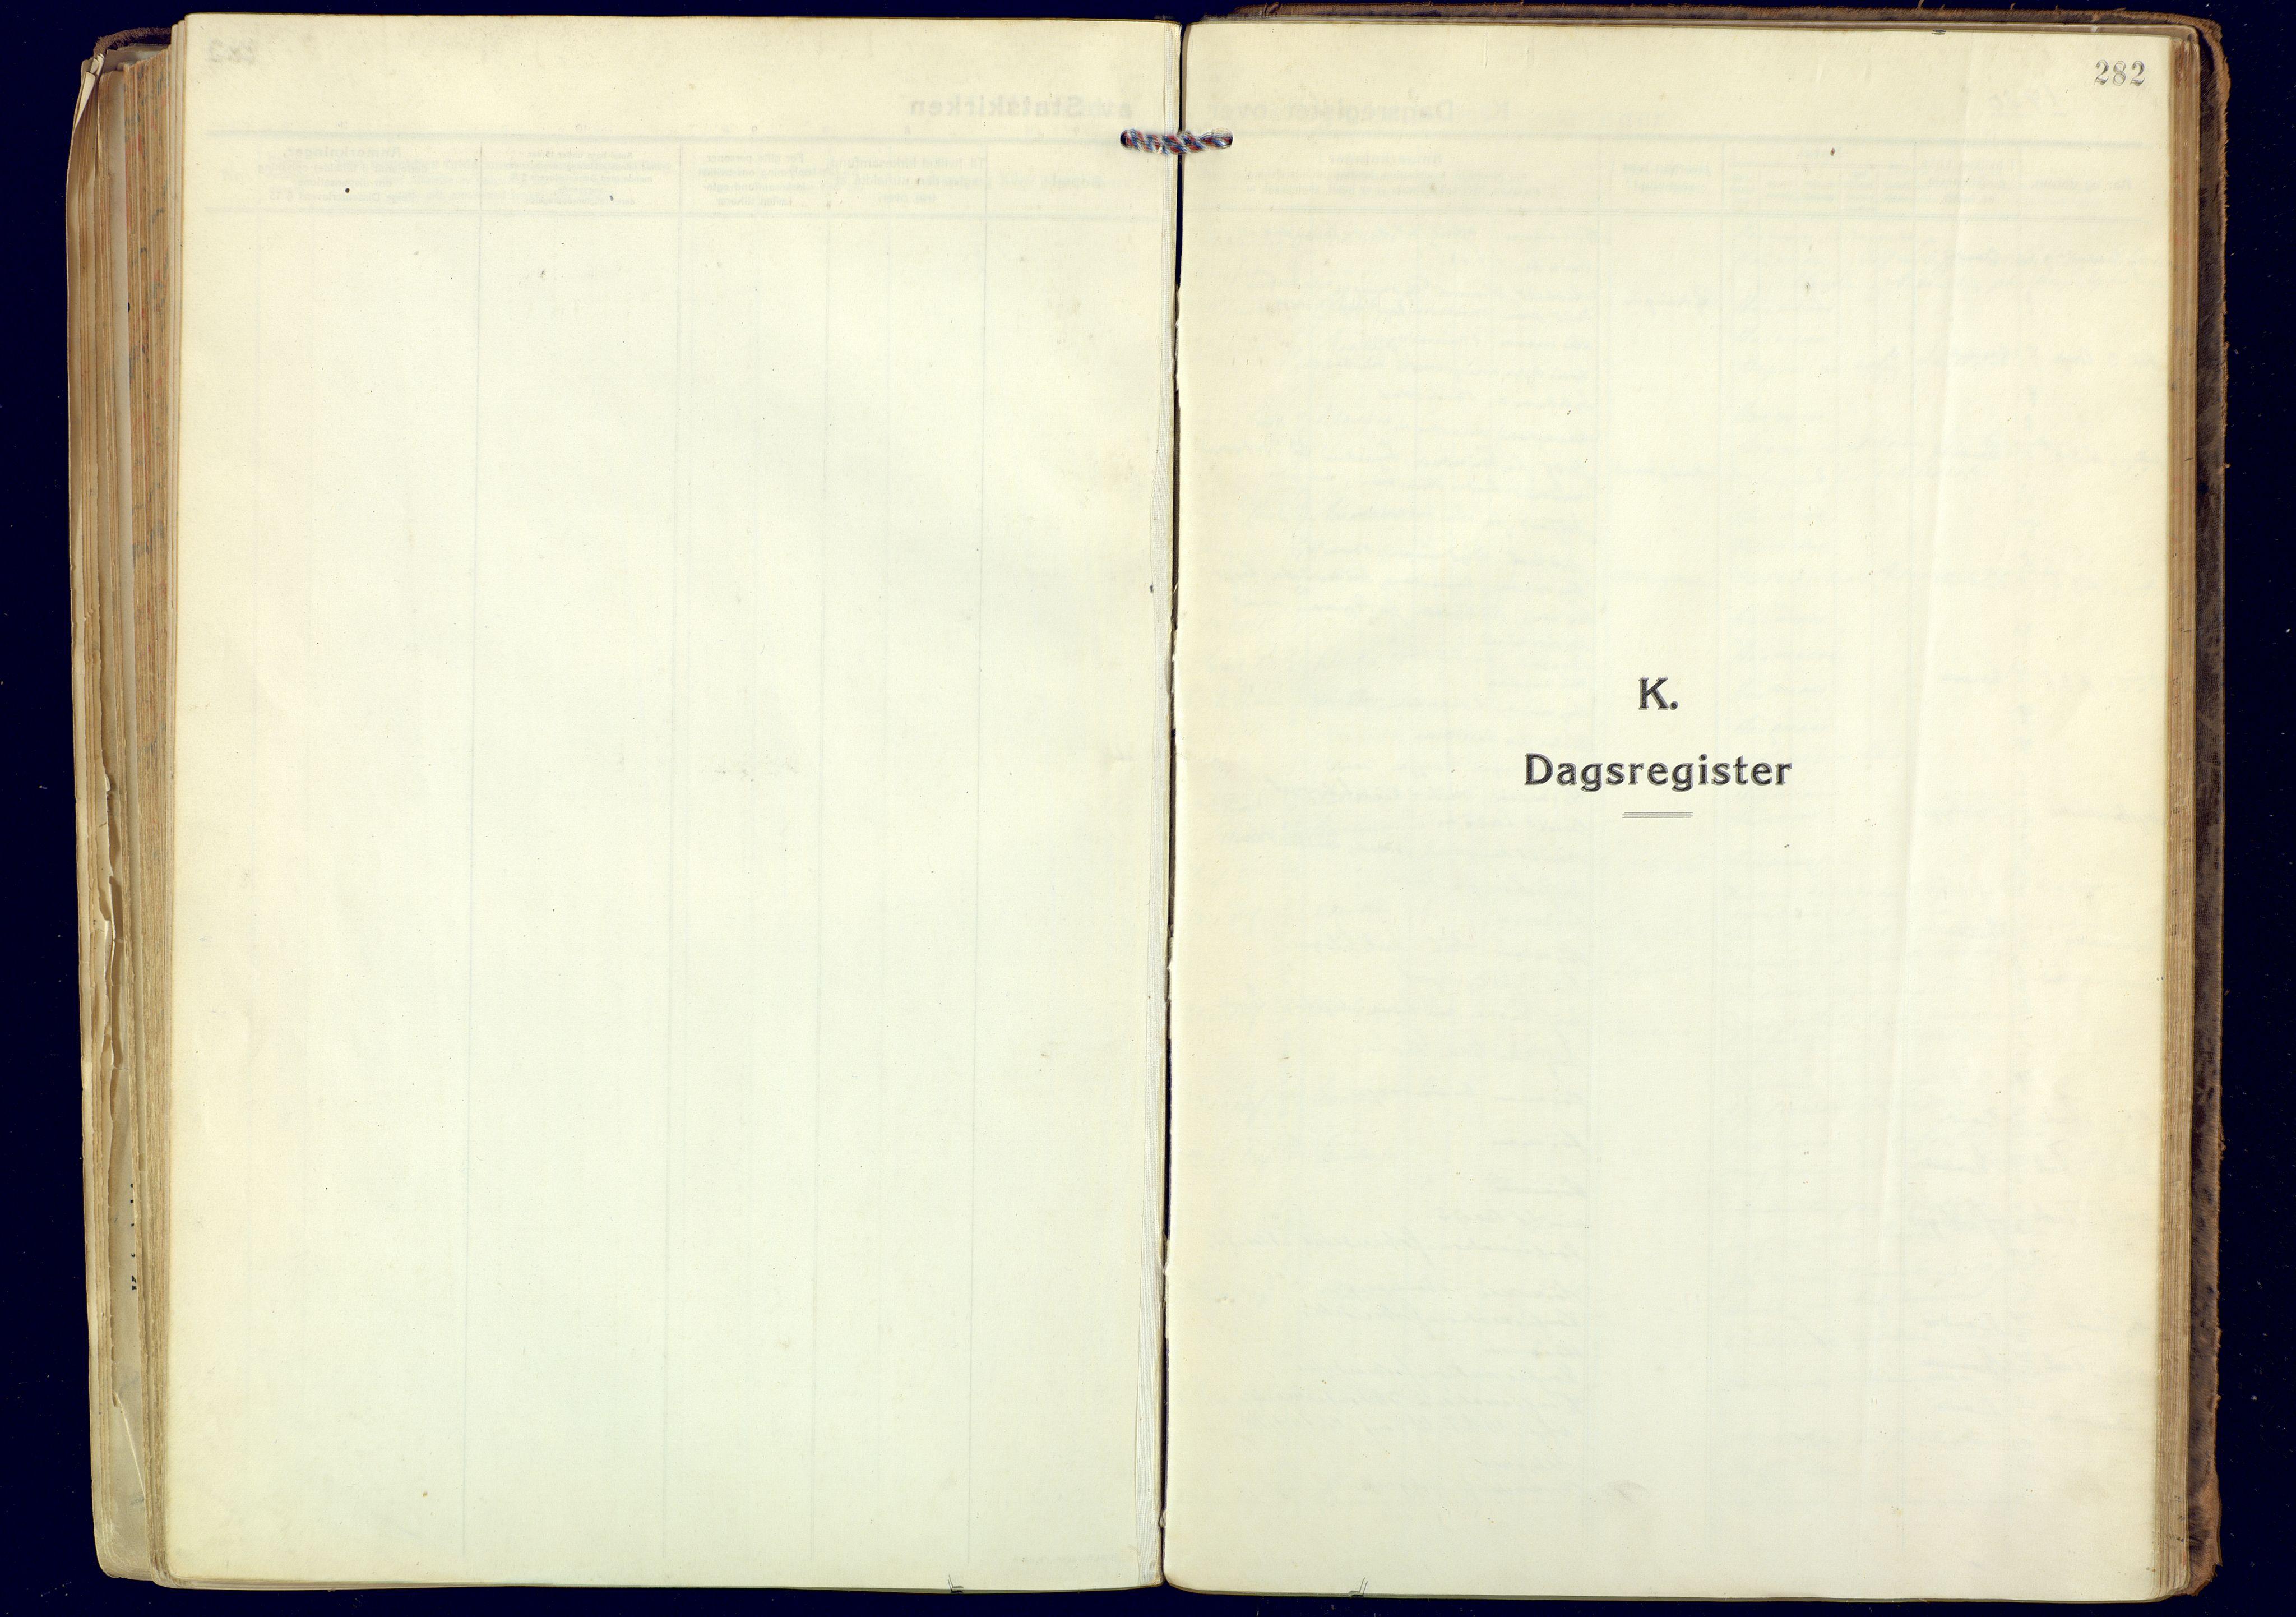 SATØ, Målselv sokneprestembete, Ministerialbok nr. 14, 1919-1932, s. 282